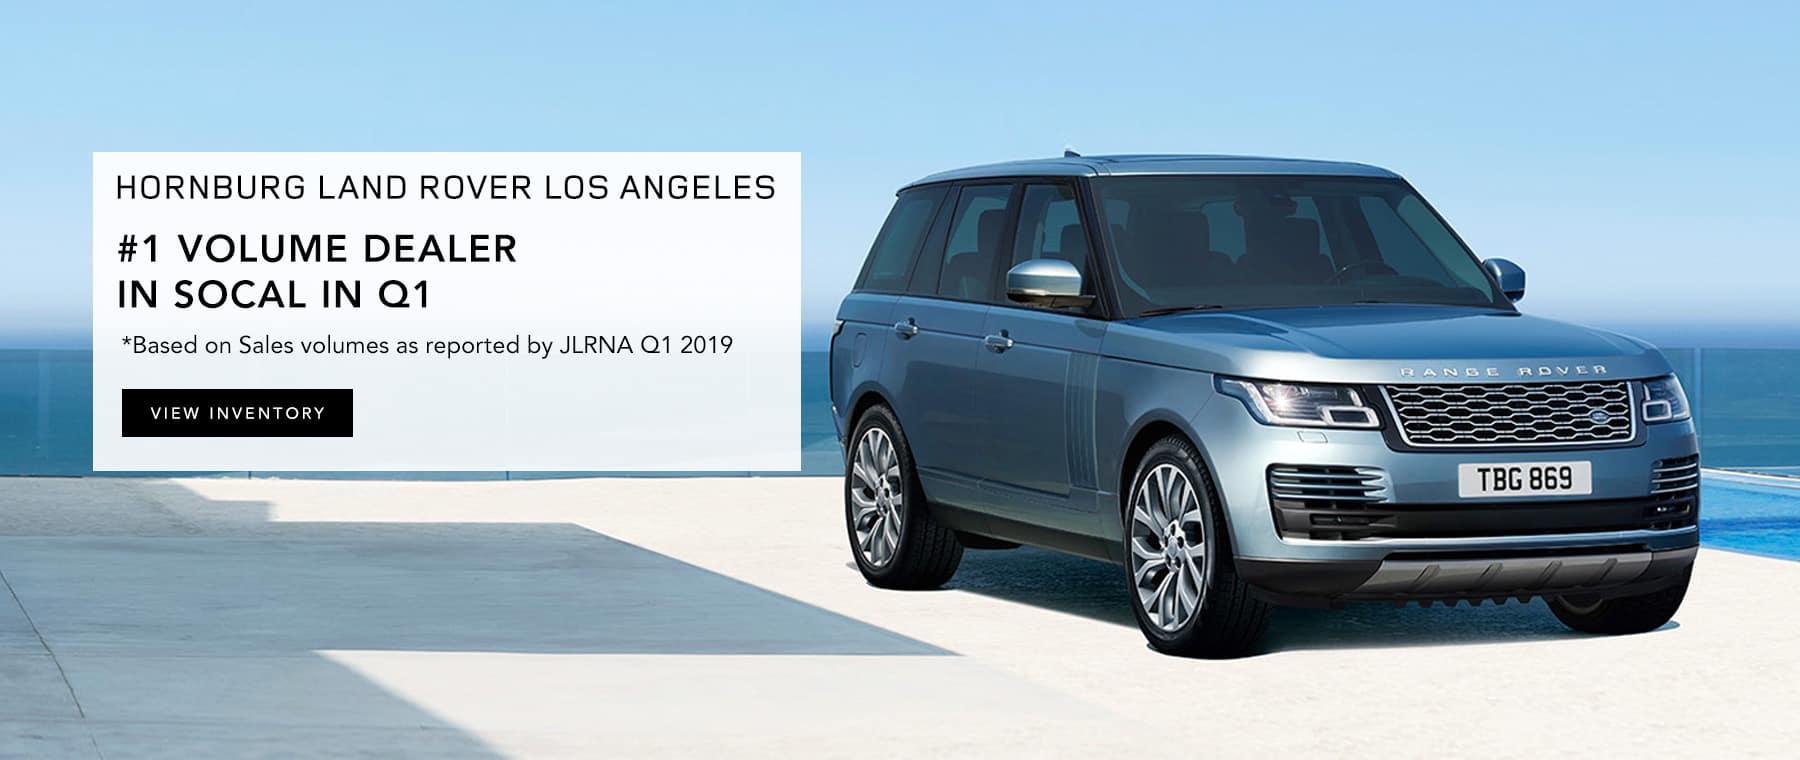 Hornburg Land Rover >> Land Rover Dealer in West Hollywood, CA | Hornburg Land ...